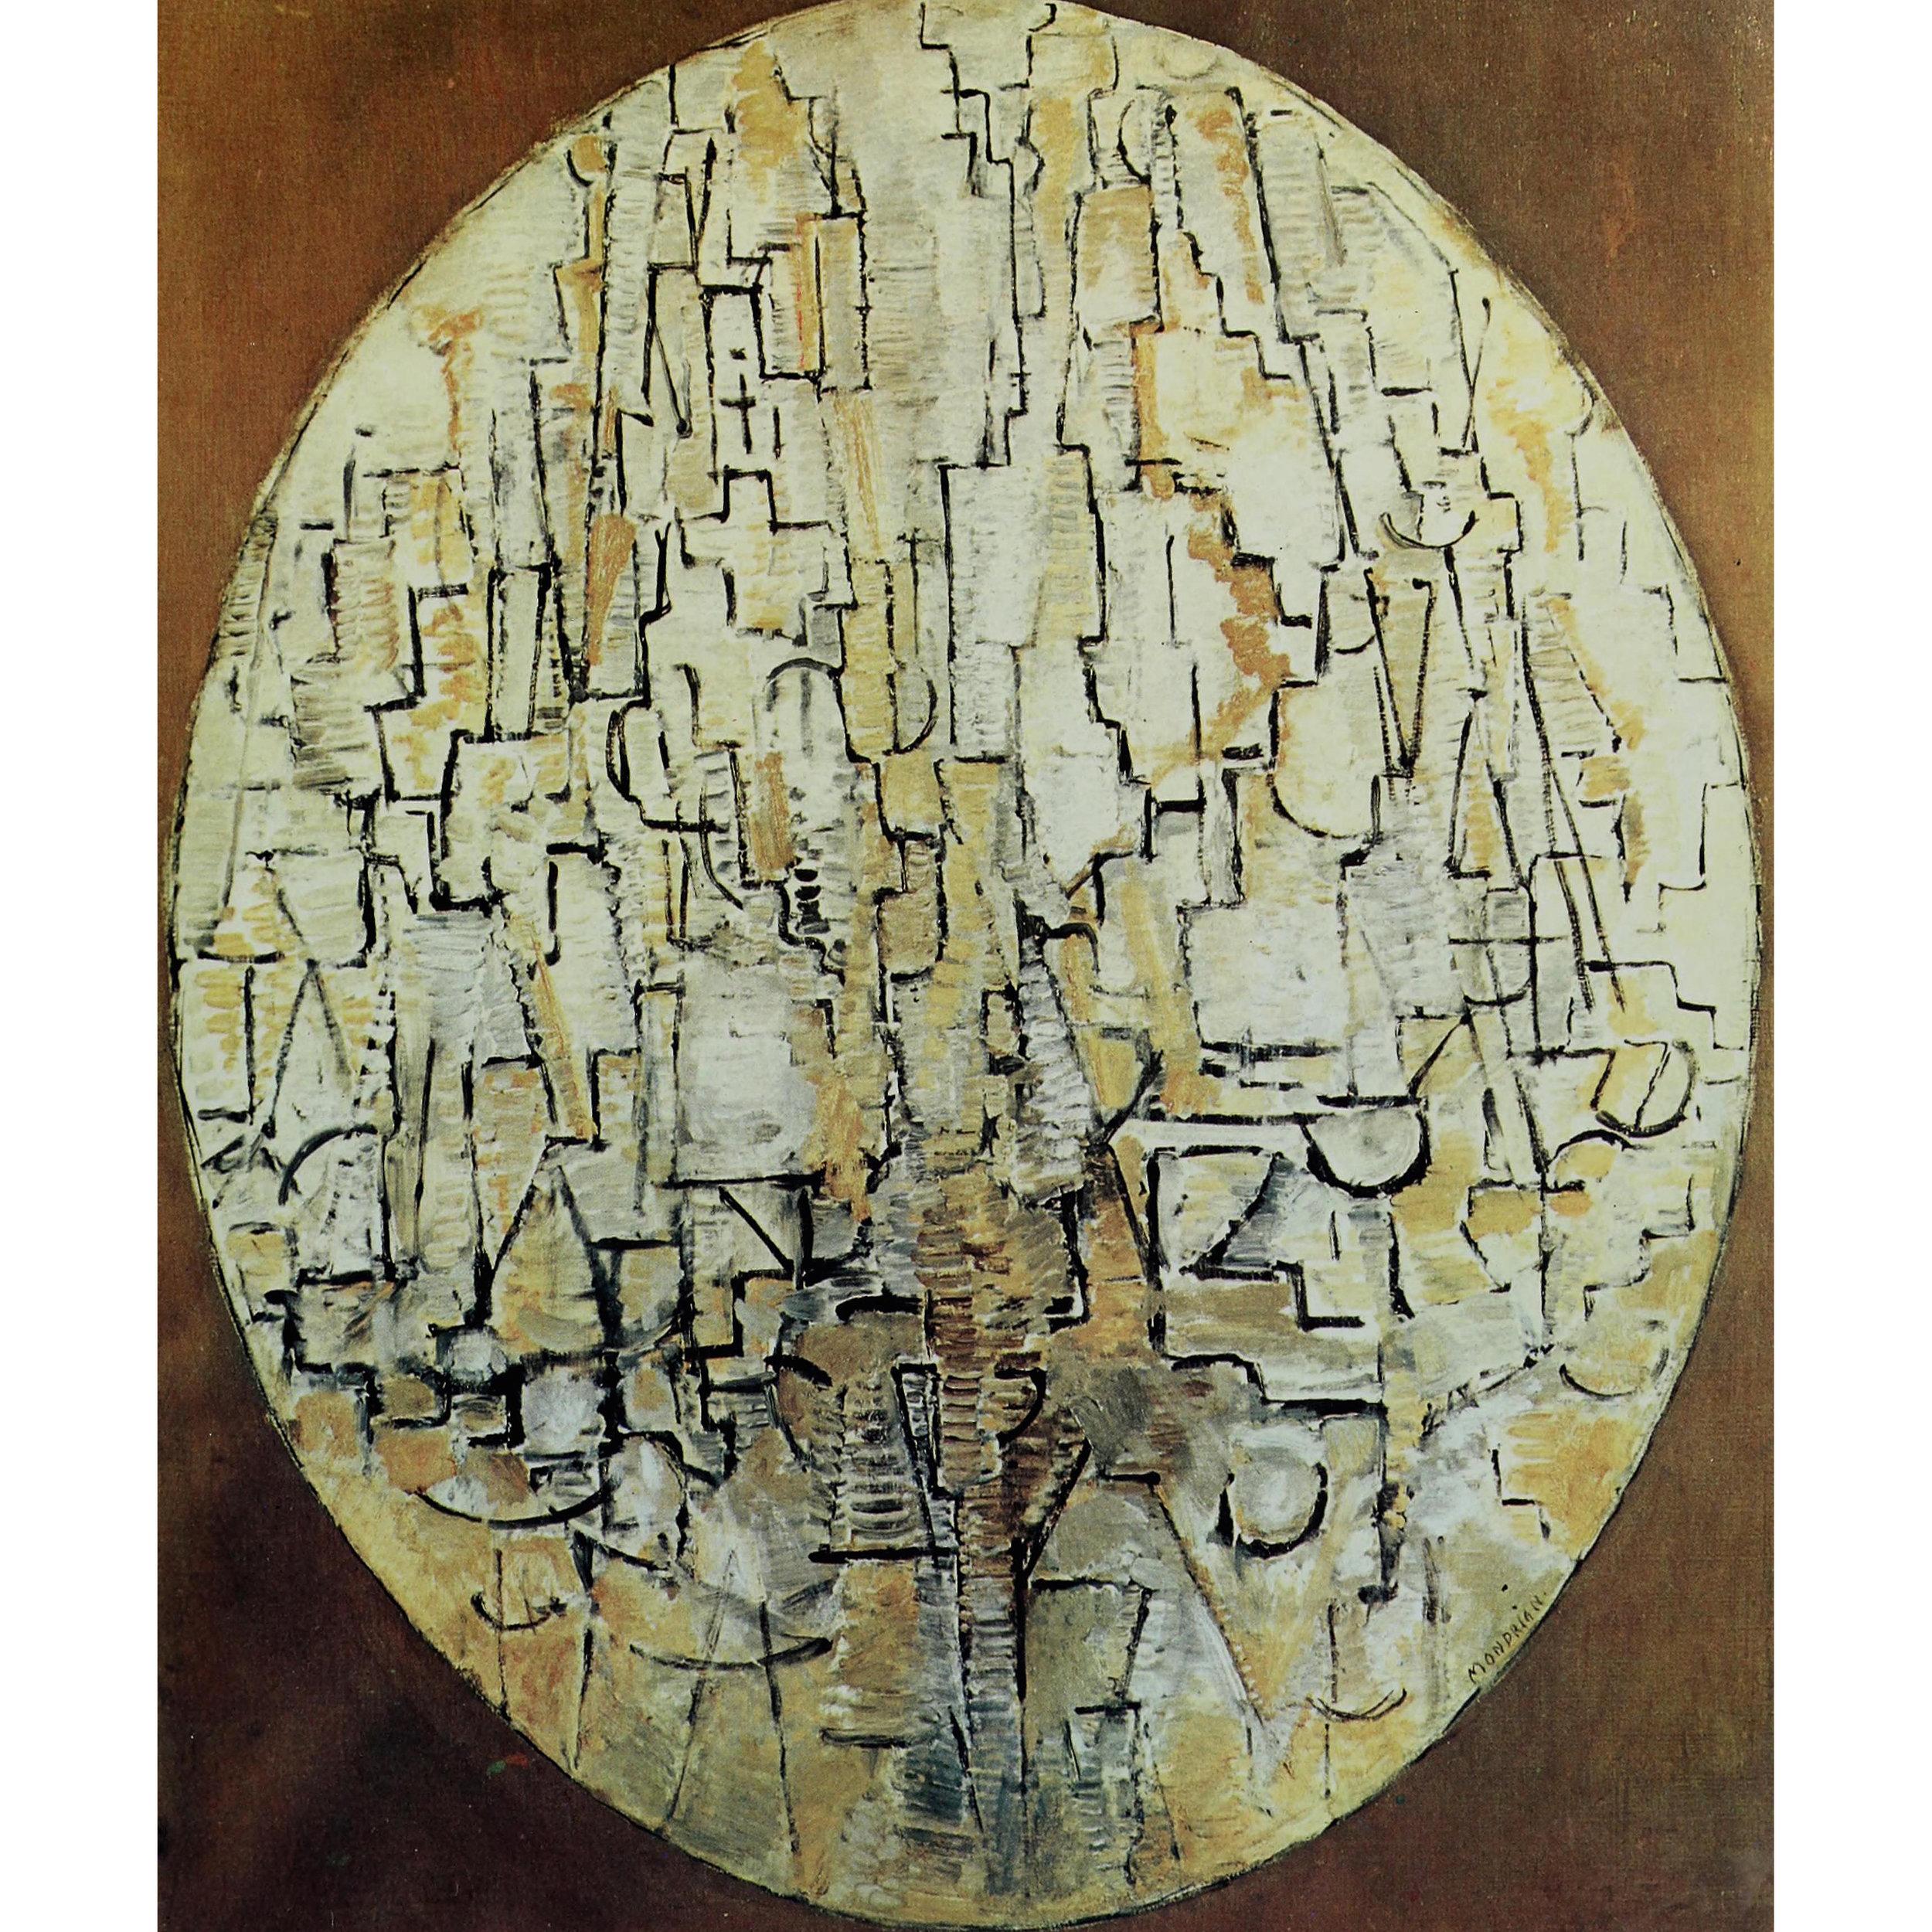 tableauno.3-compositioninoval-1913-ianwilliamcraig.jpg